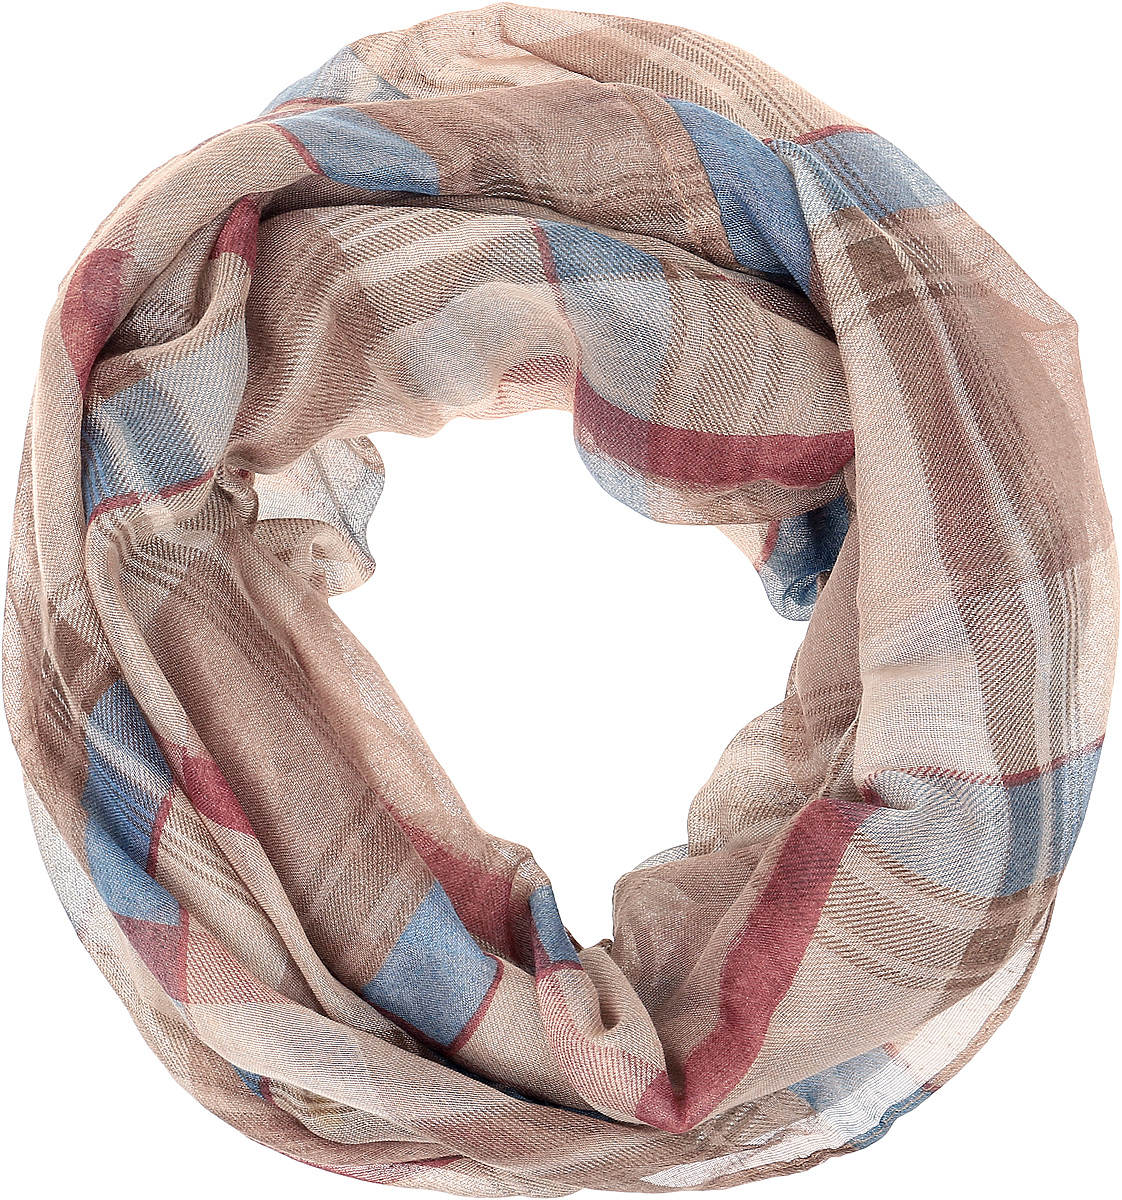 Снуд женский Vittorio Richi, цвет: голубой, коричневый. Ro02PC3054/9556-2. Размер 70 см х 90 смRo02PC3054/9556-2Снуд из легкой хлопкоподобной ткани. Принт.